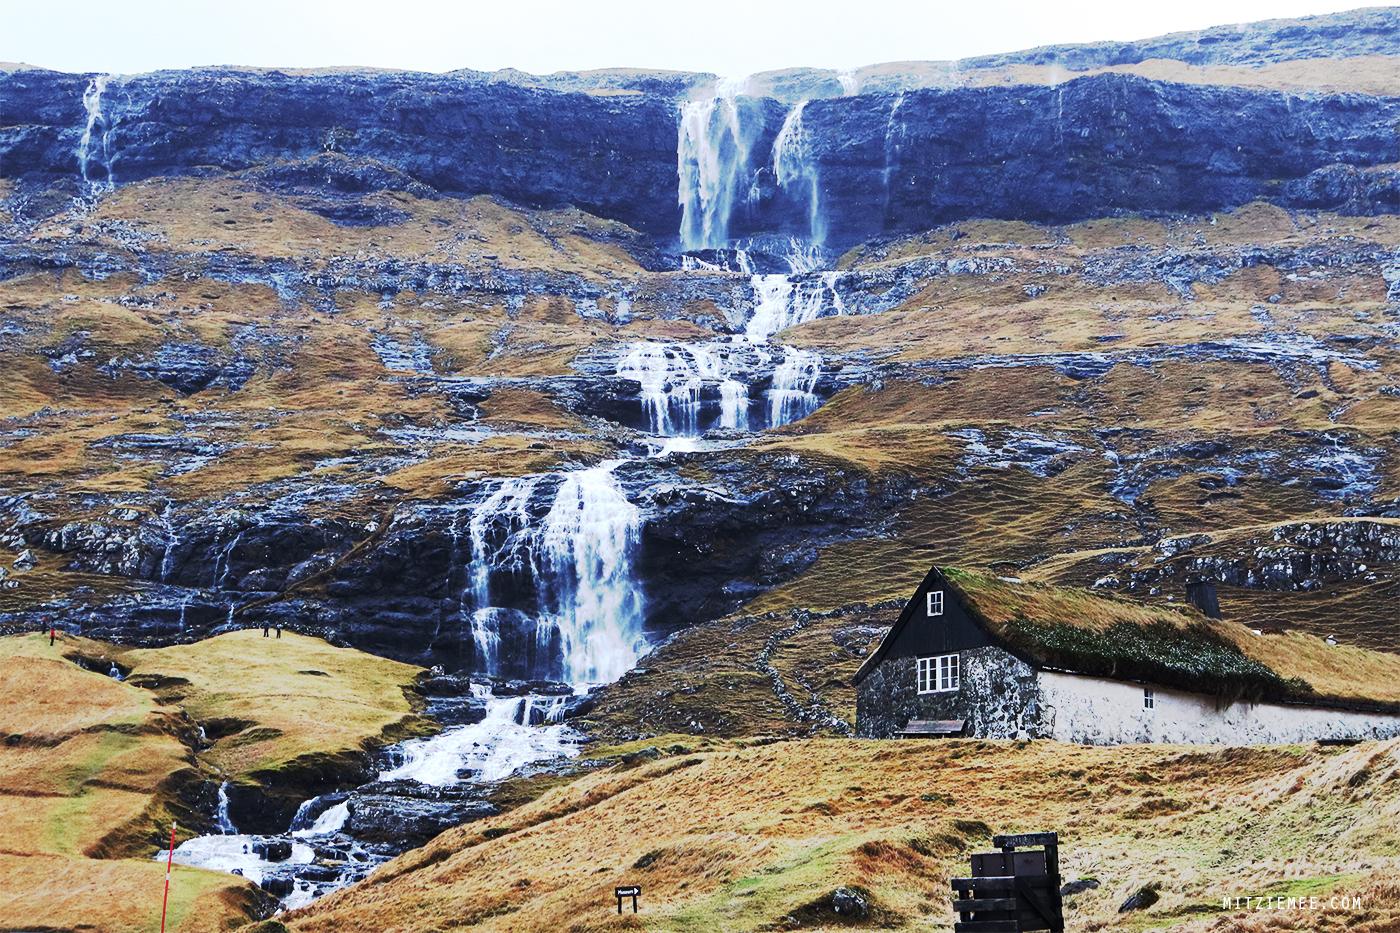 Faroe Islands road trip to Saksun